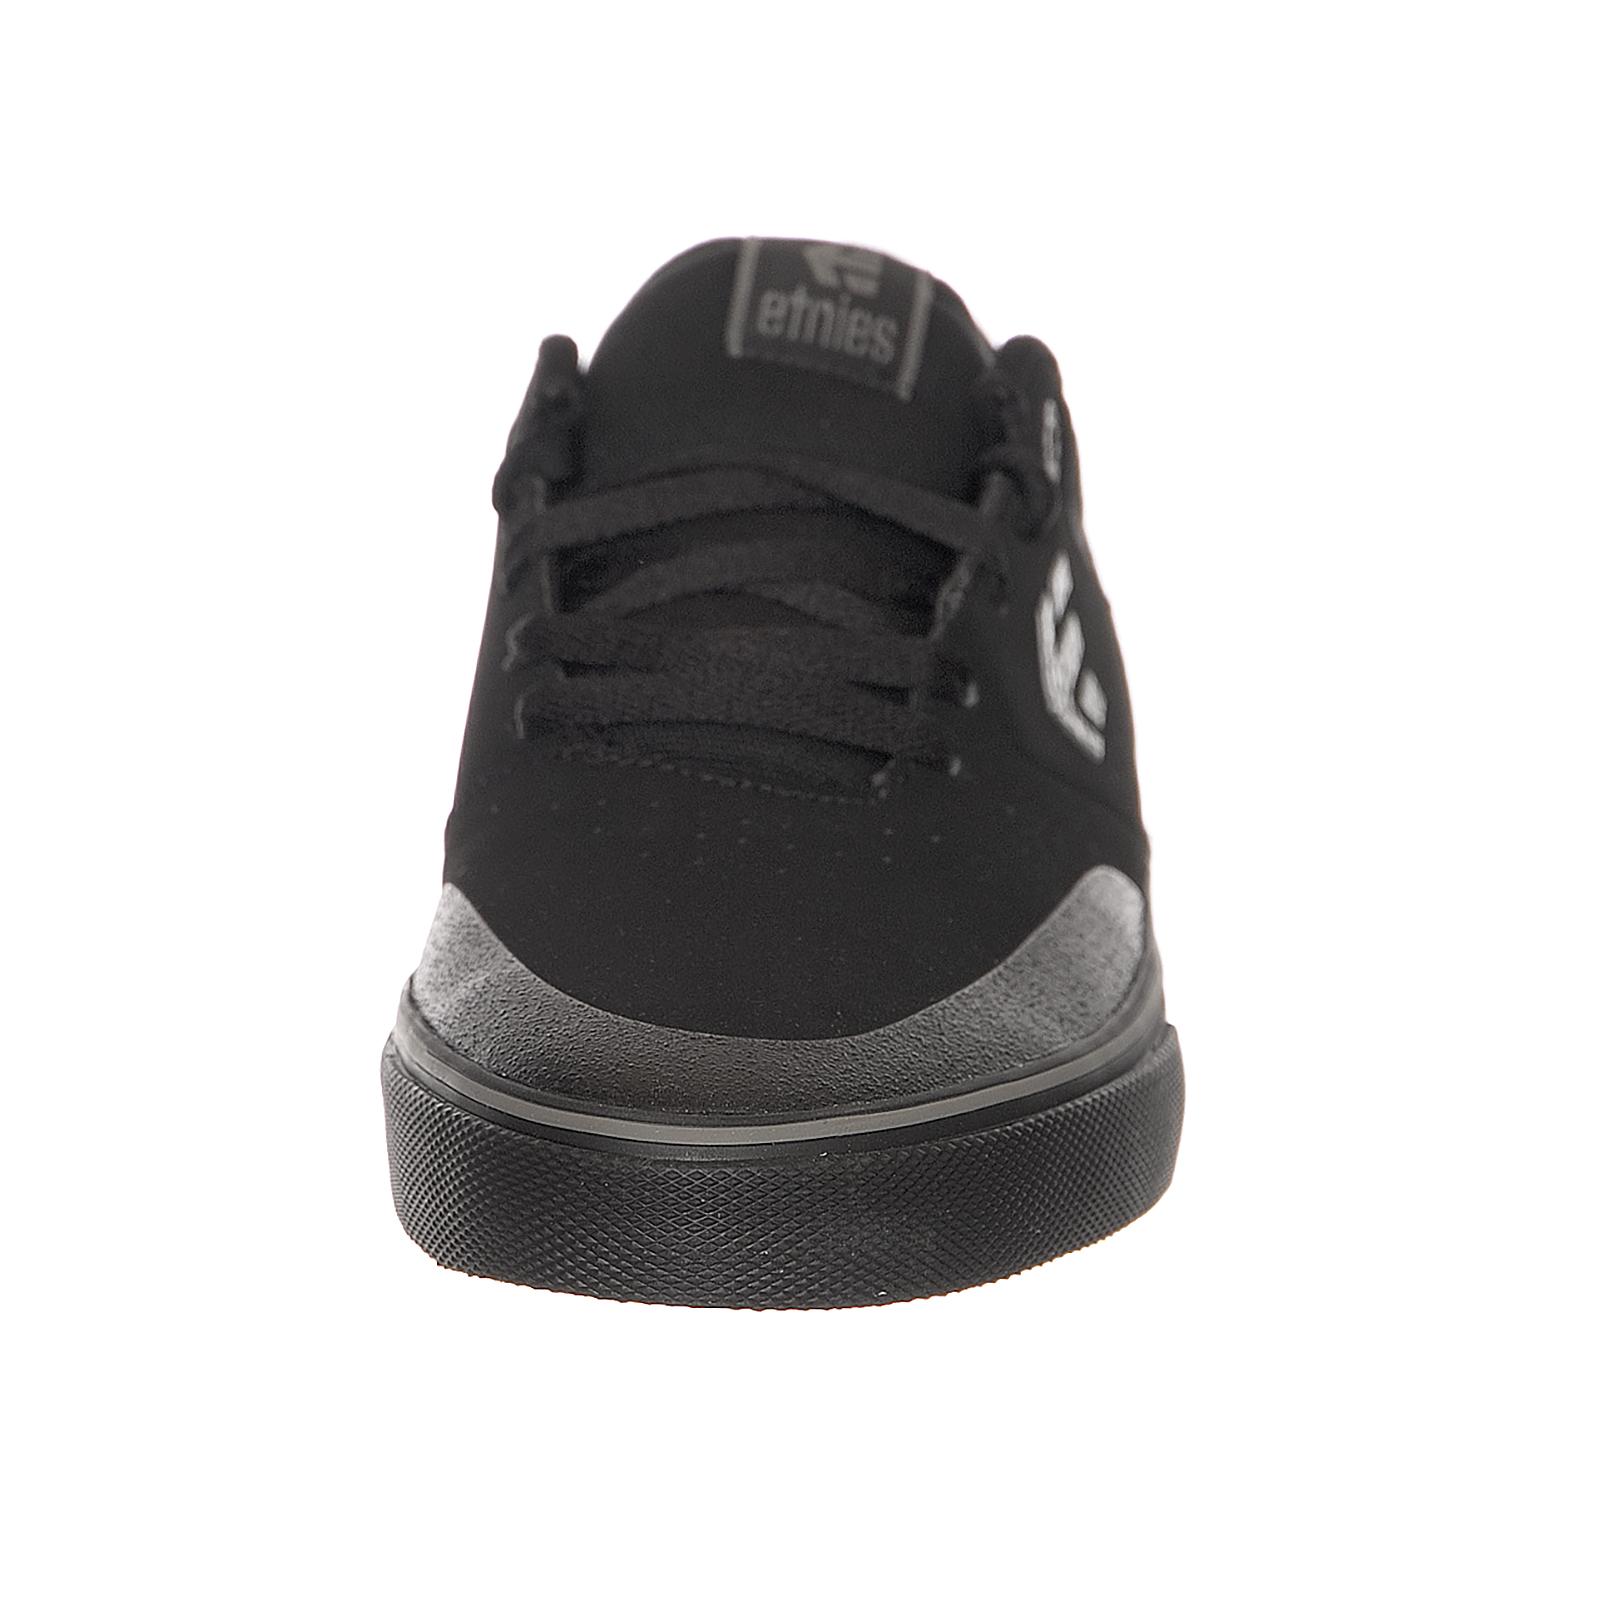 Etnies Sneakers Marana Vulc Black/Dark Grey Nero Nero Nero 8fd8fd